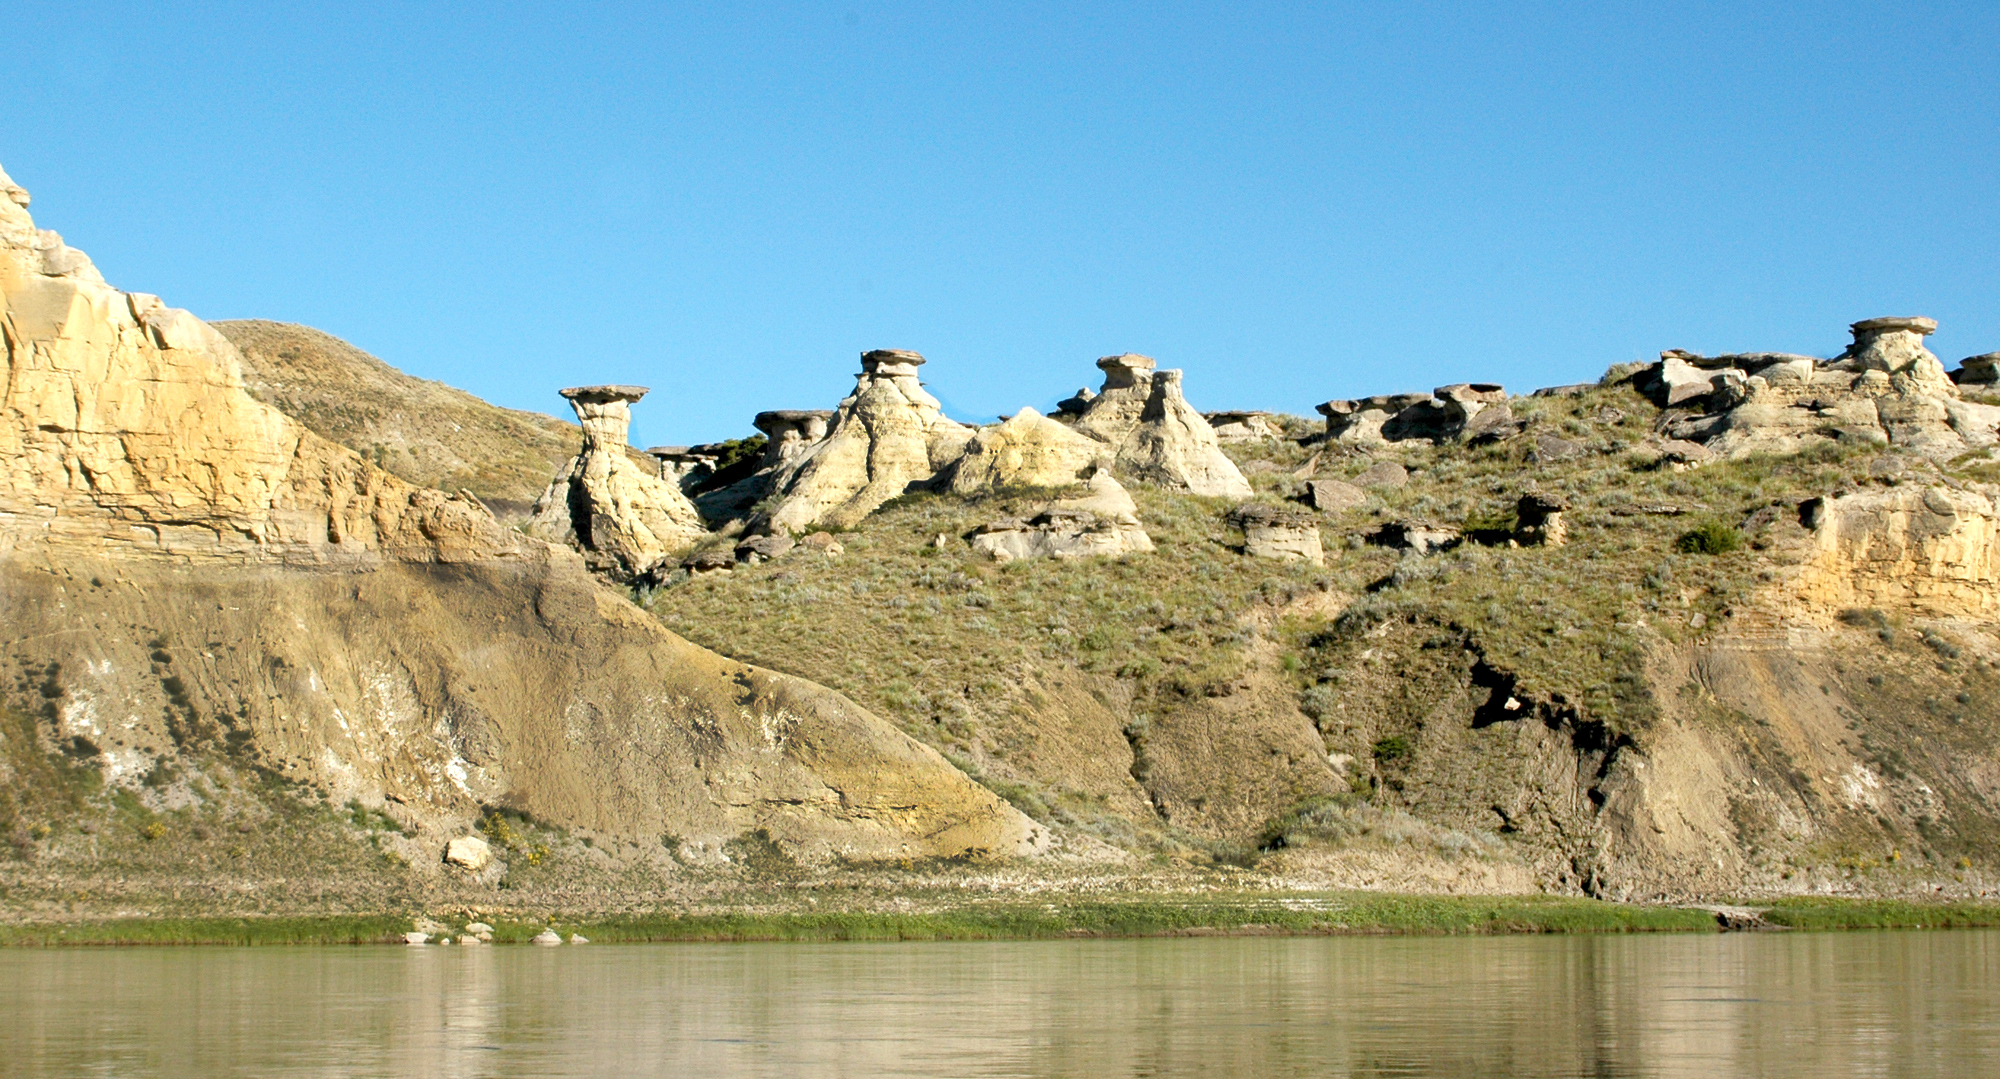 Nez Perce/Cow Island Boating Adventure